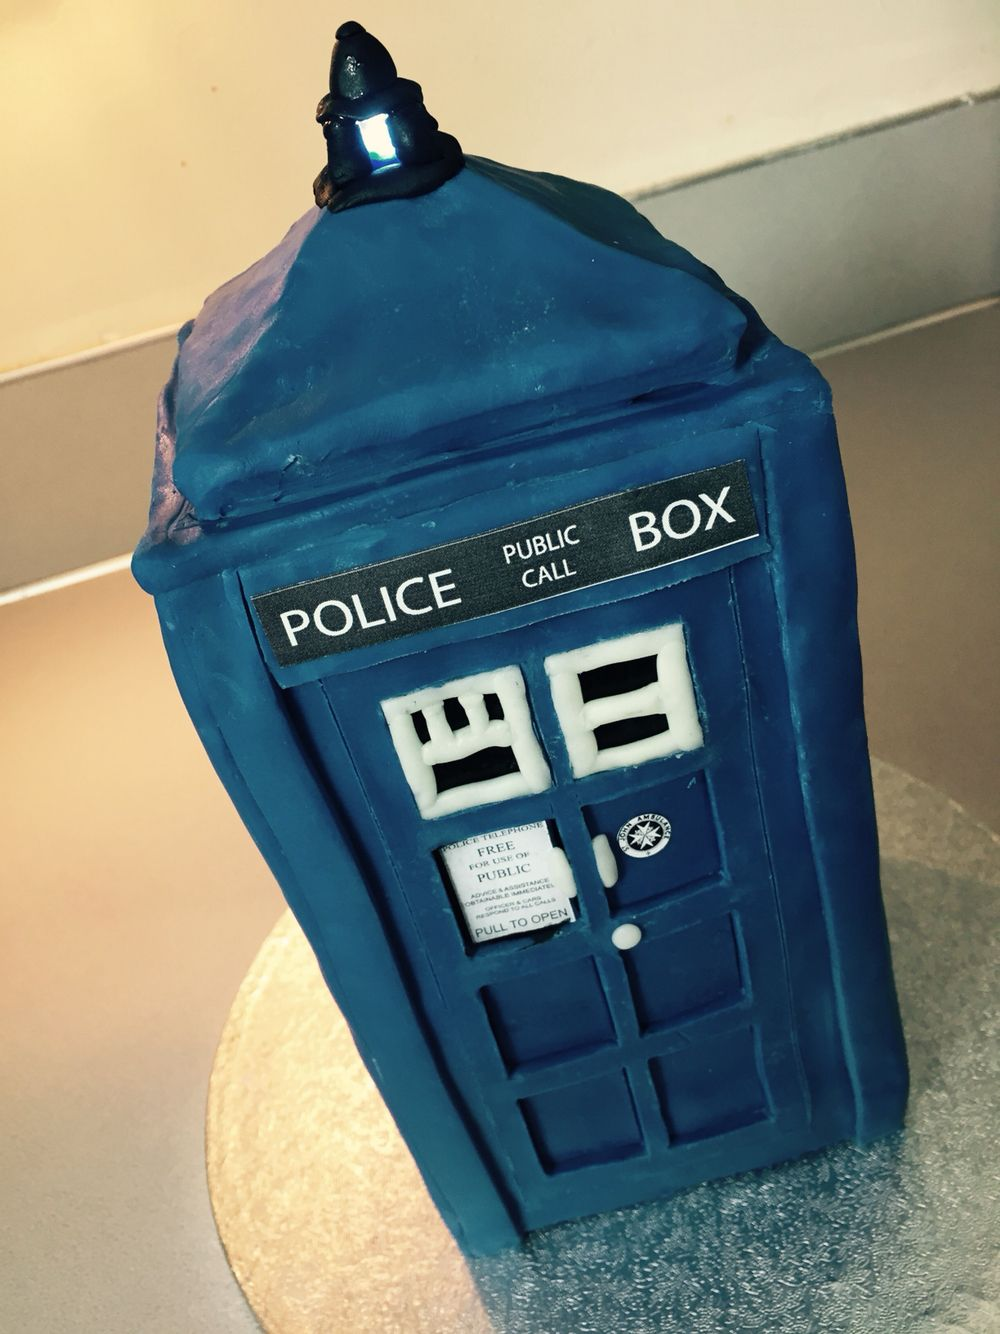 Dr Who Tardis Cake.